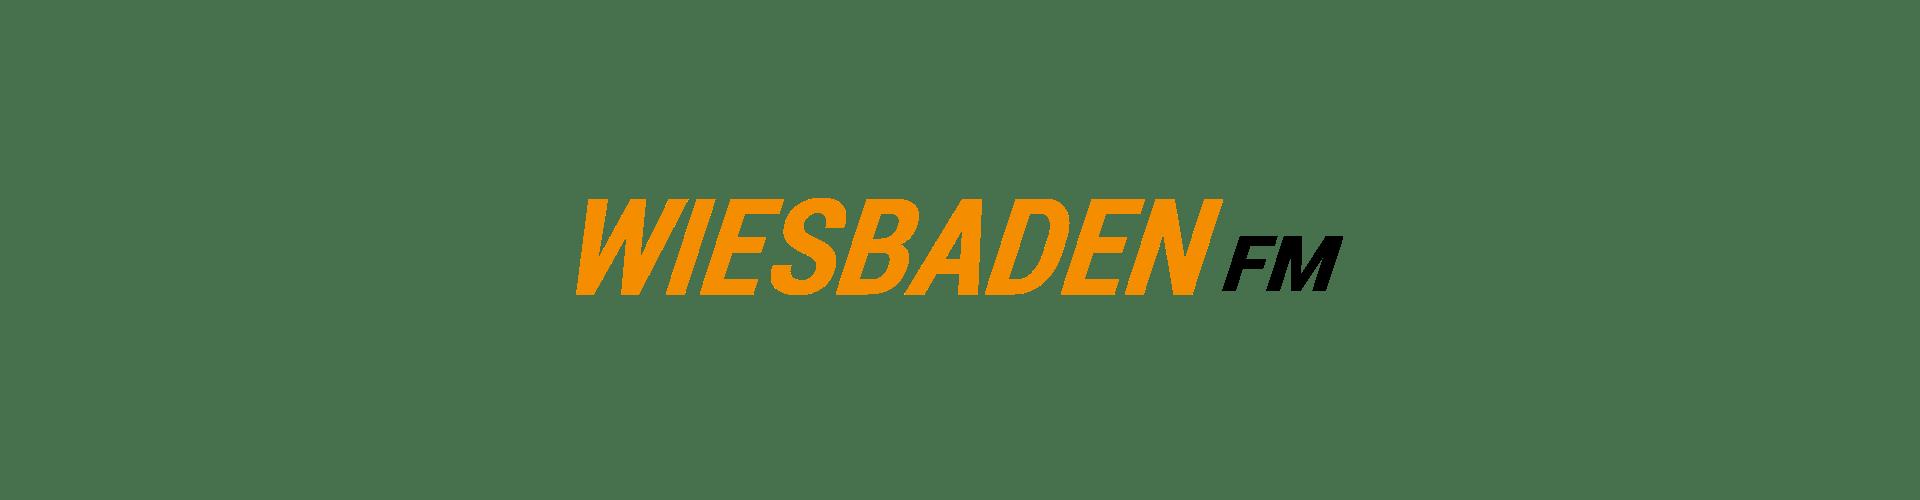 Wiesbaden FM